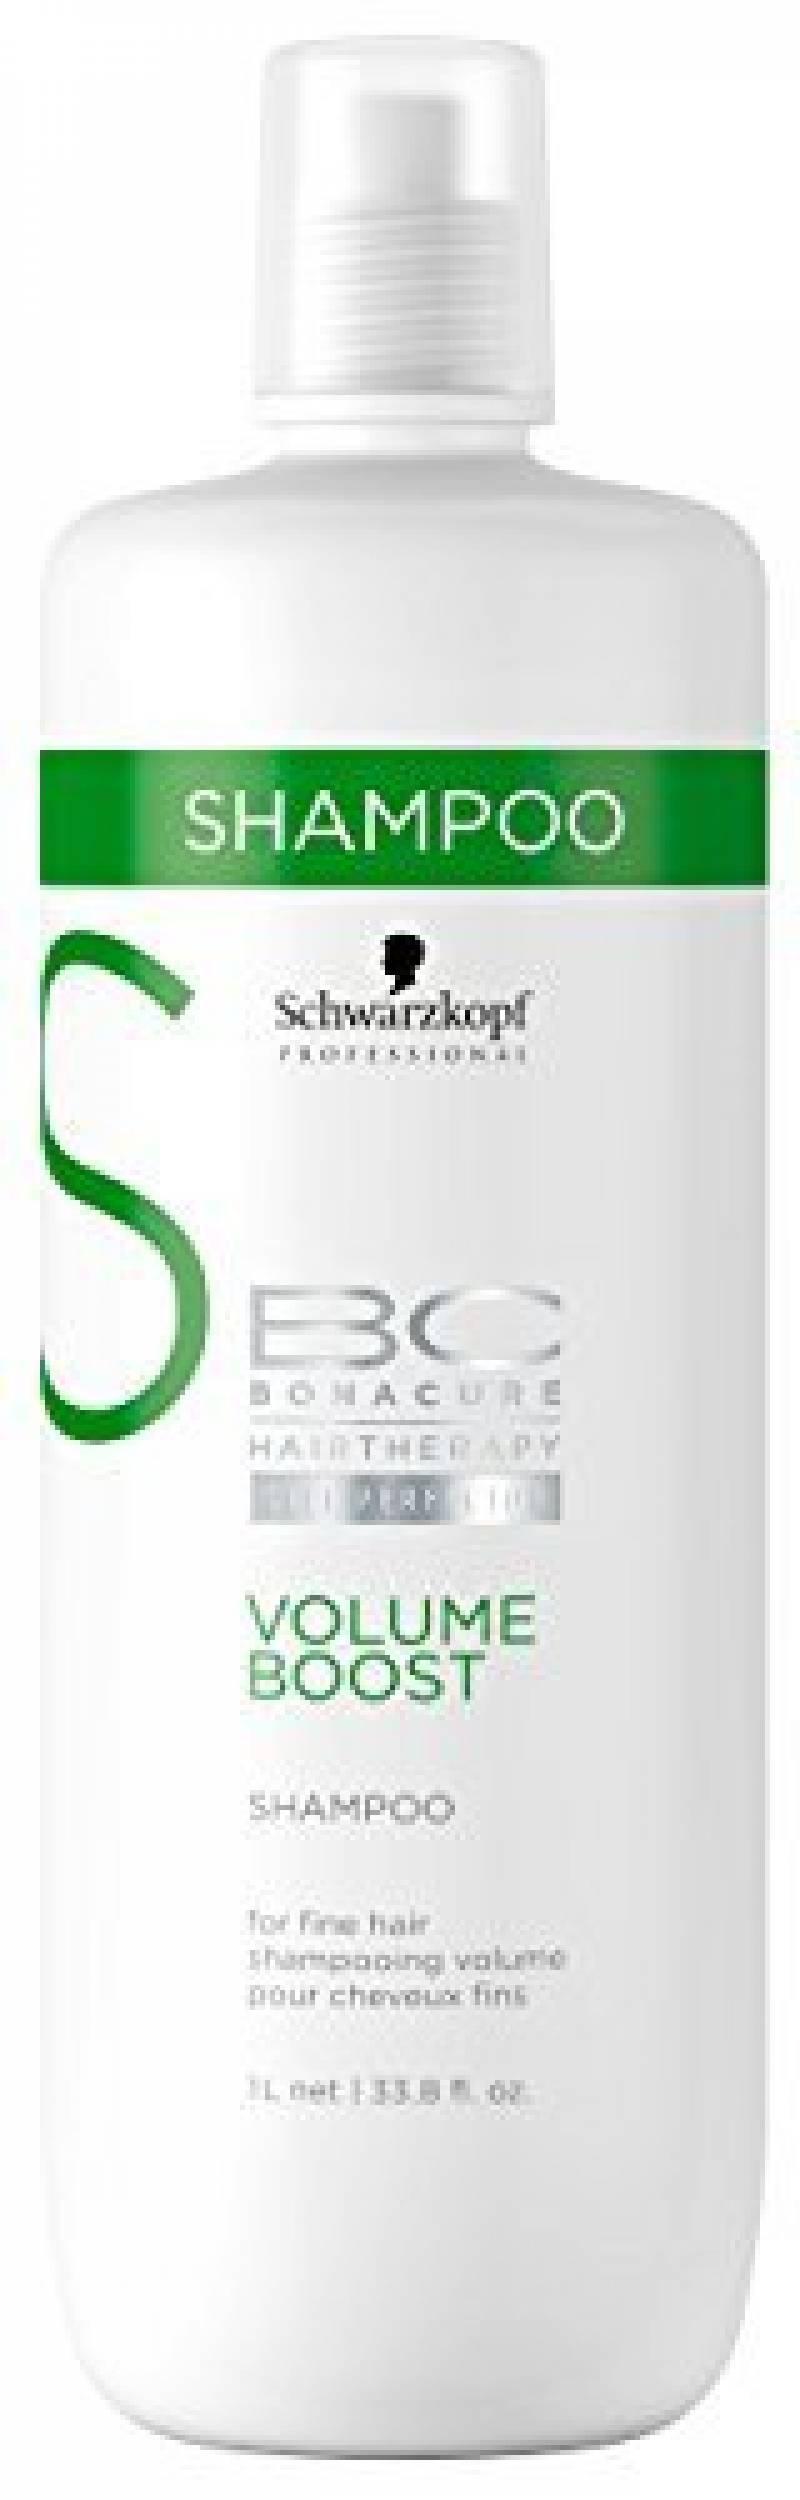 Schwarzkopf Bc Volume Boost Shampooing 1000ml de la marque Schwarzkopf TOP 3 image 0 produit